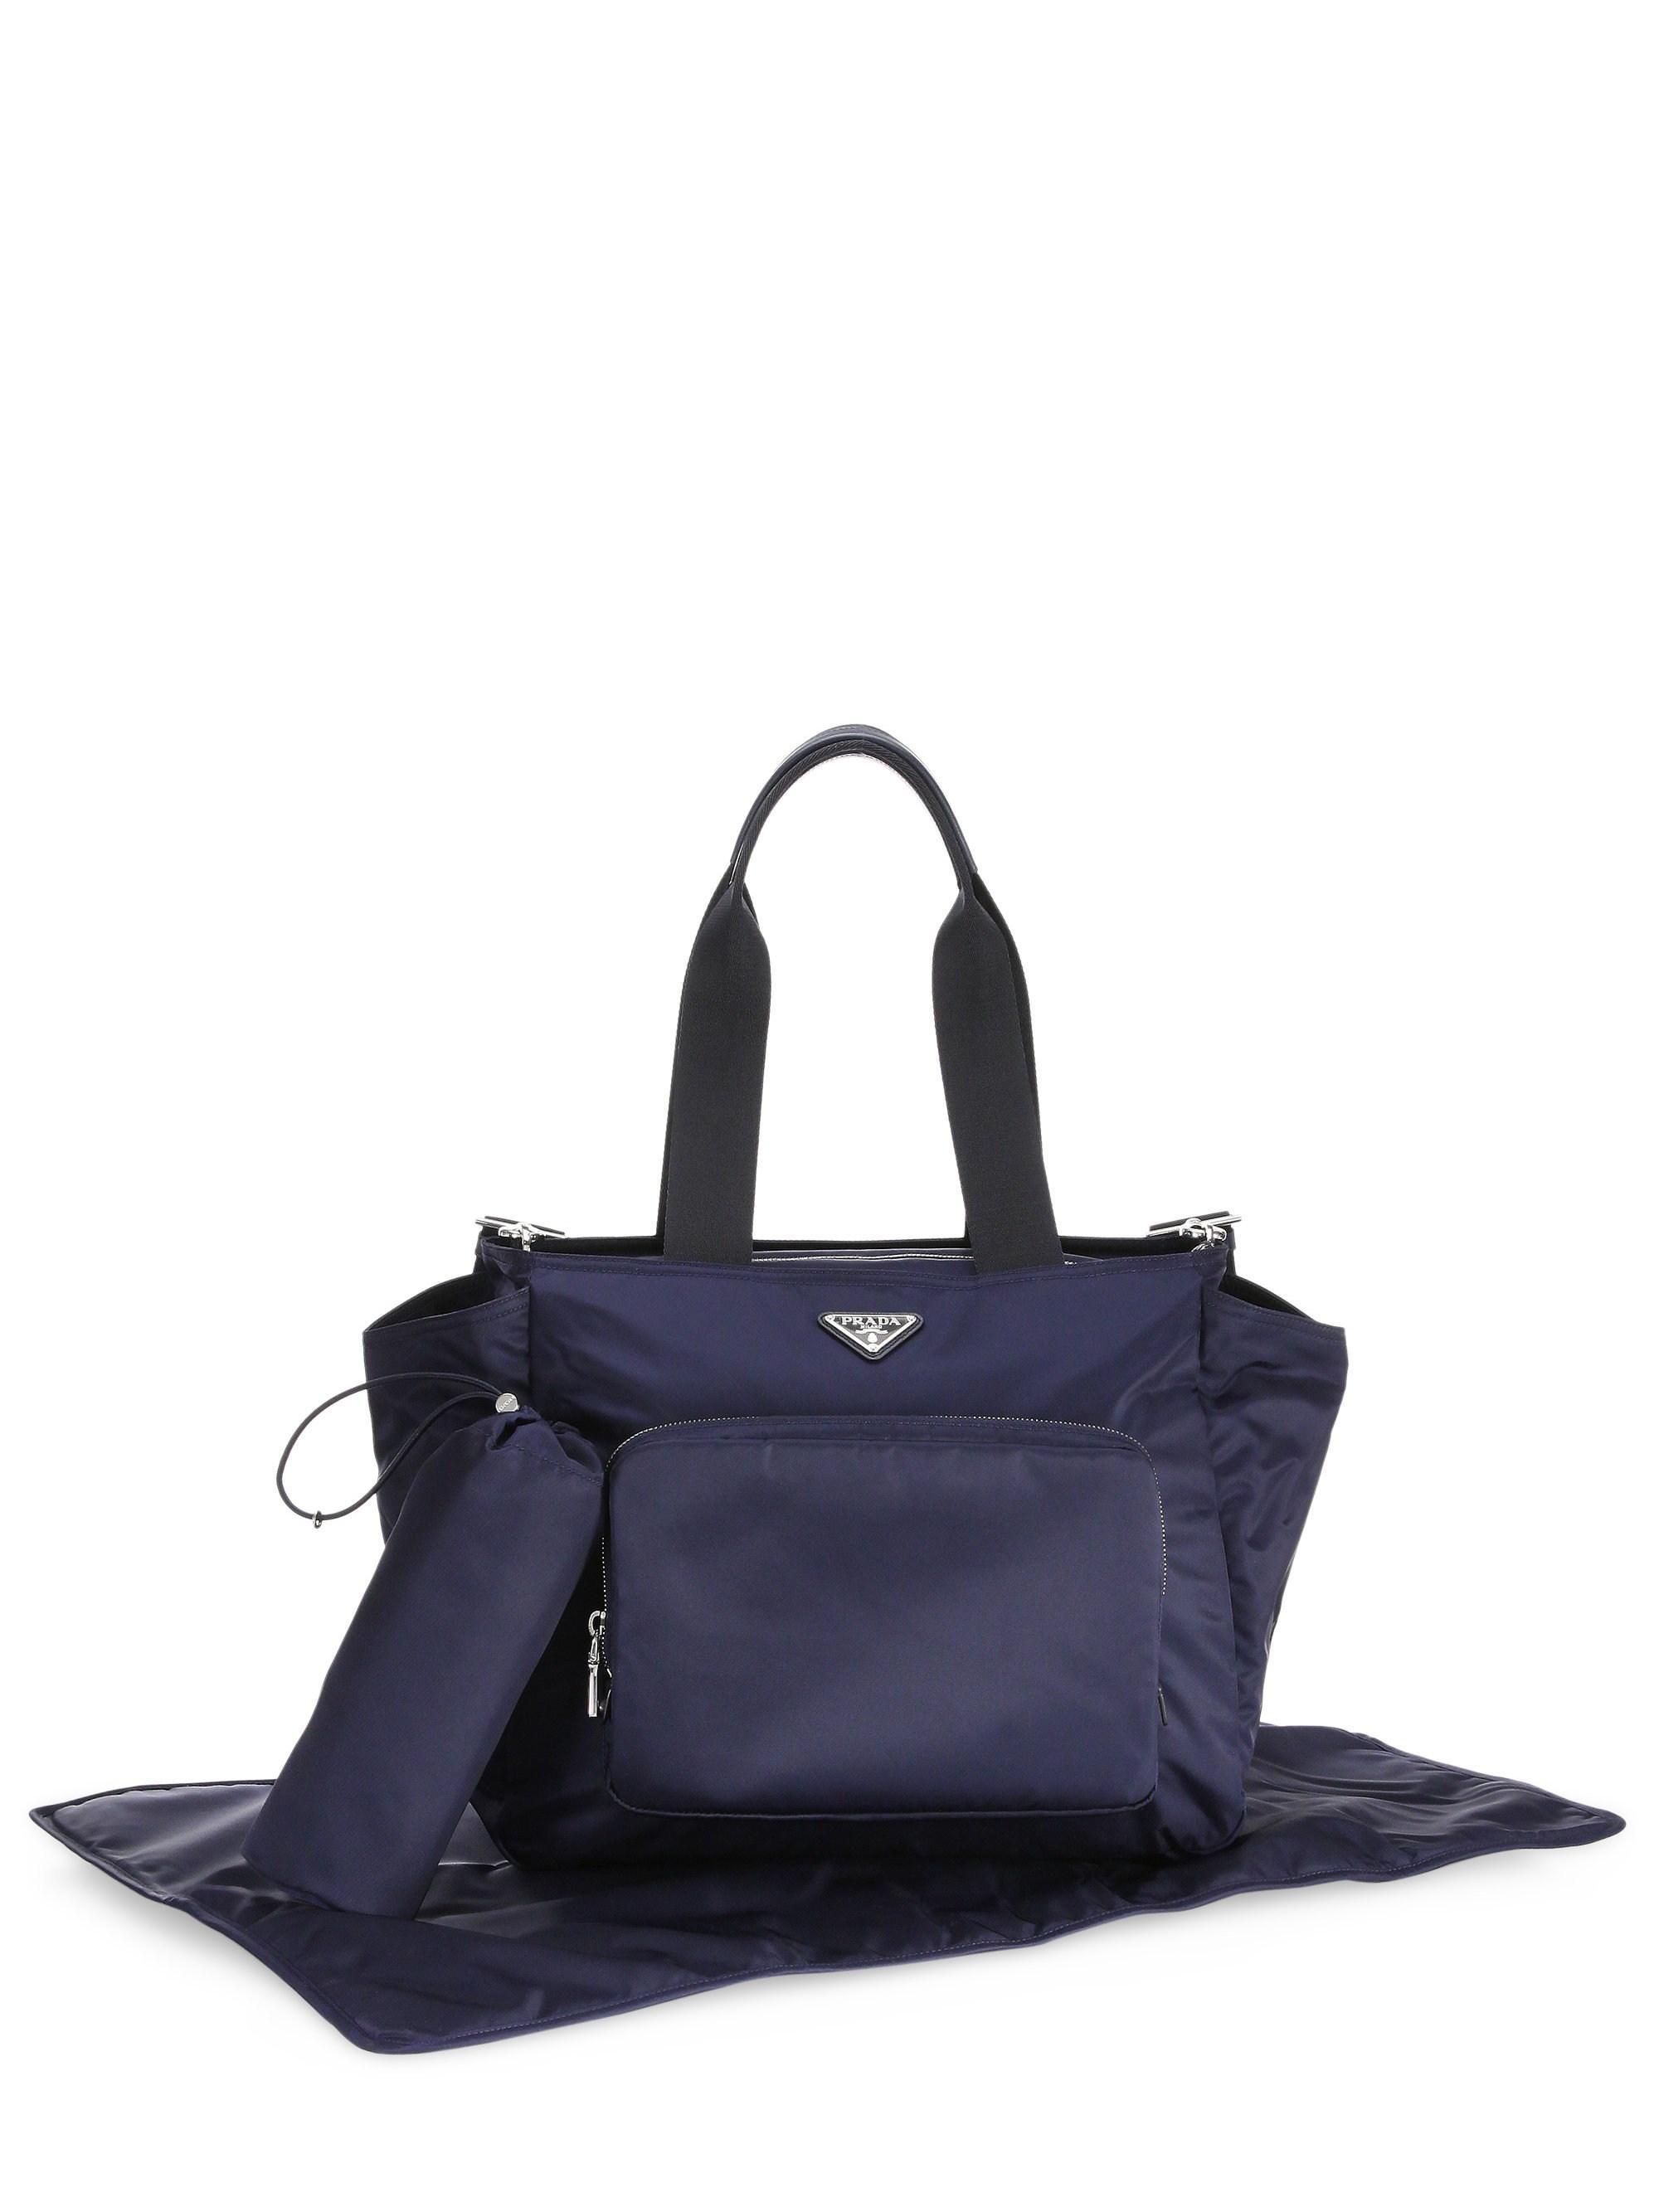 f01df2d59657 Prada Nylon Diaper Bag in Blue - Lyst